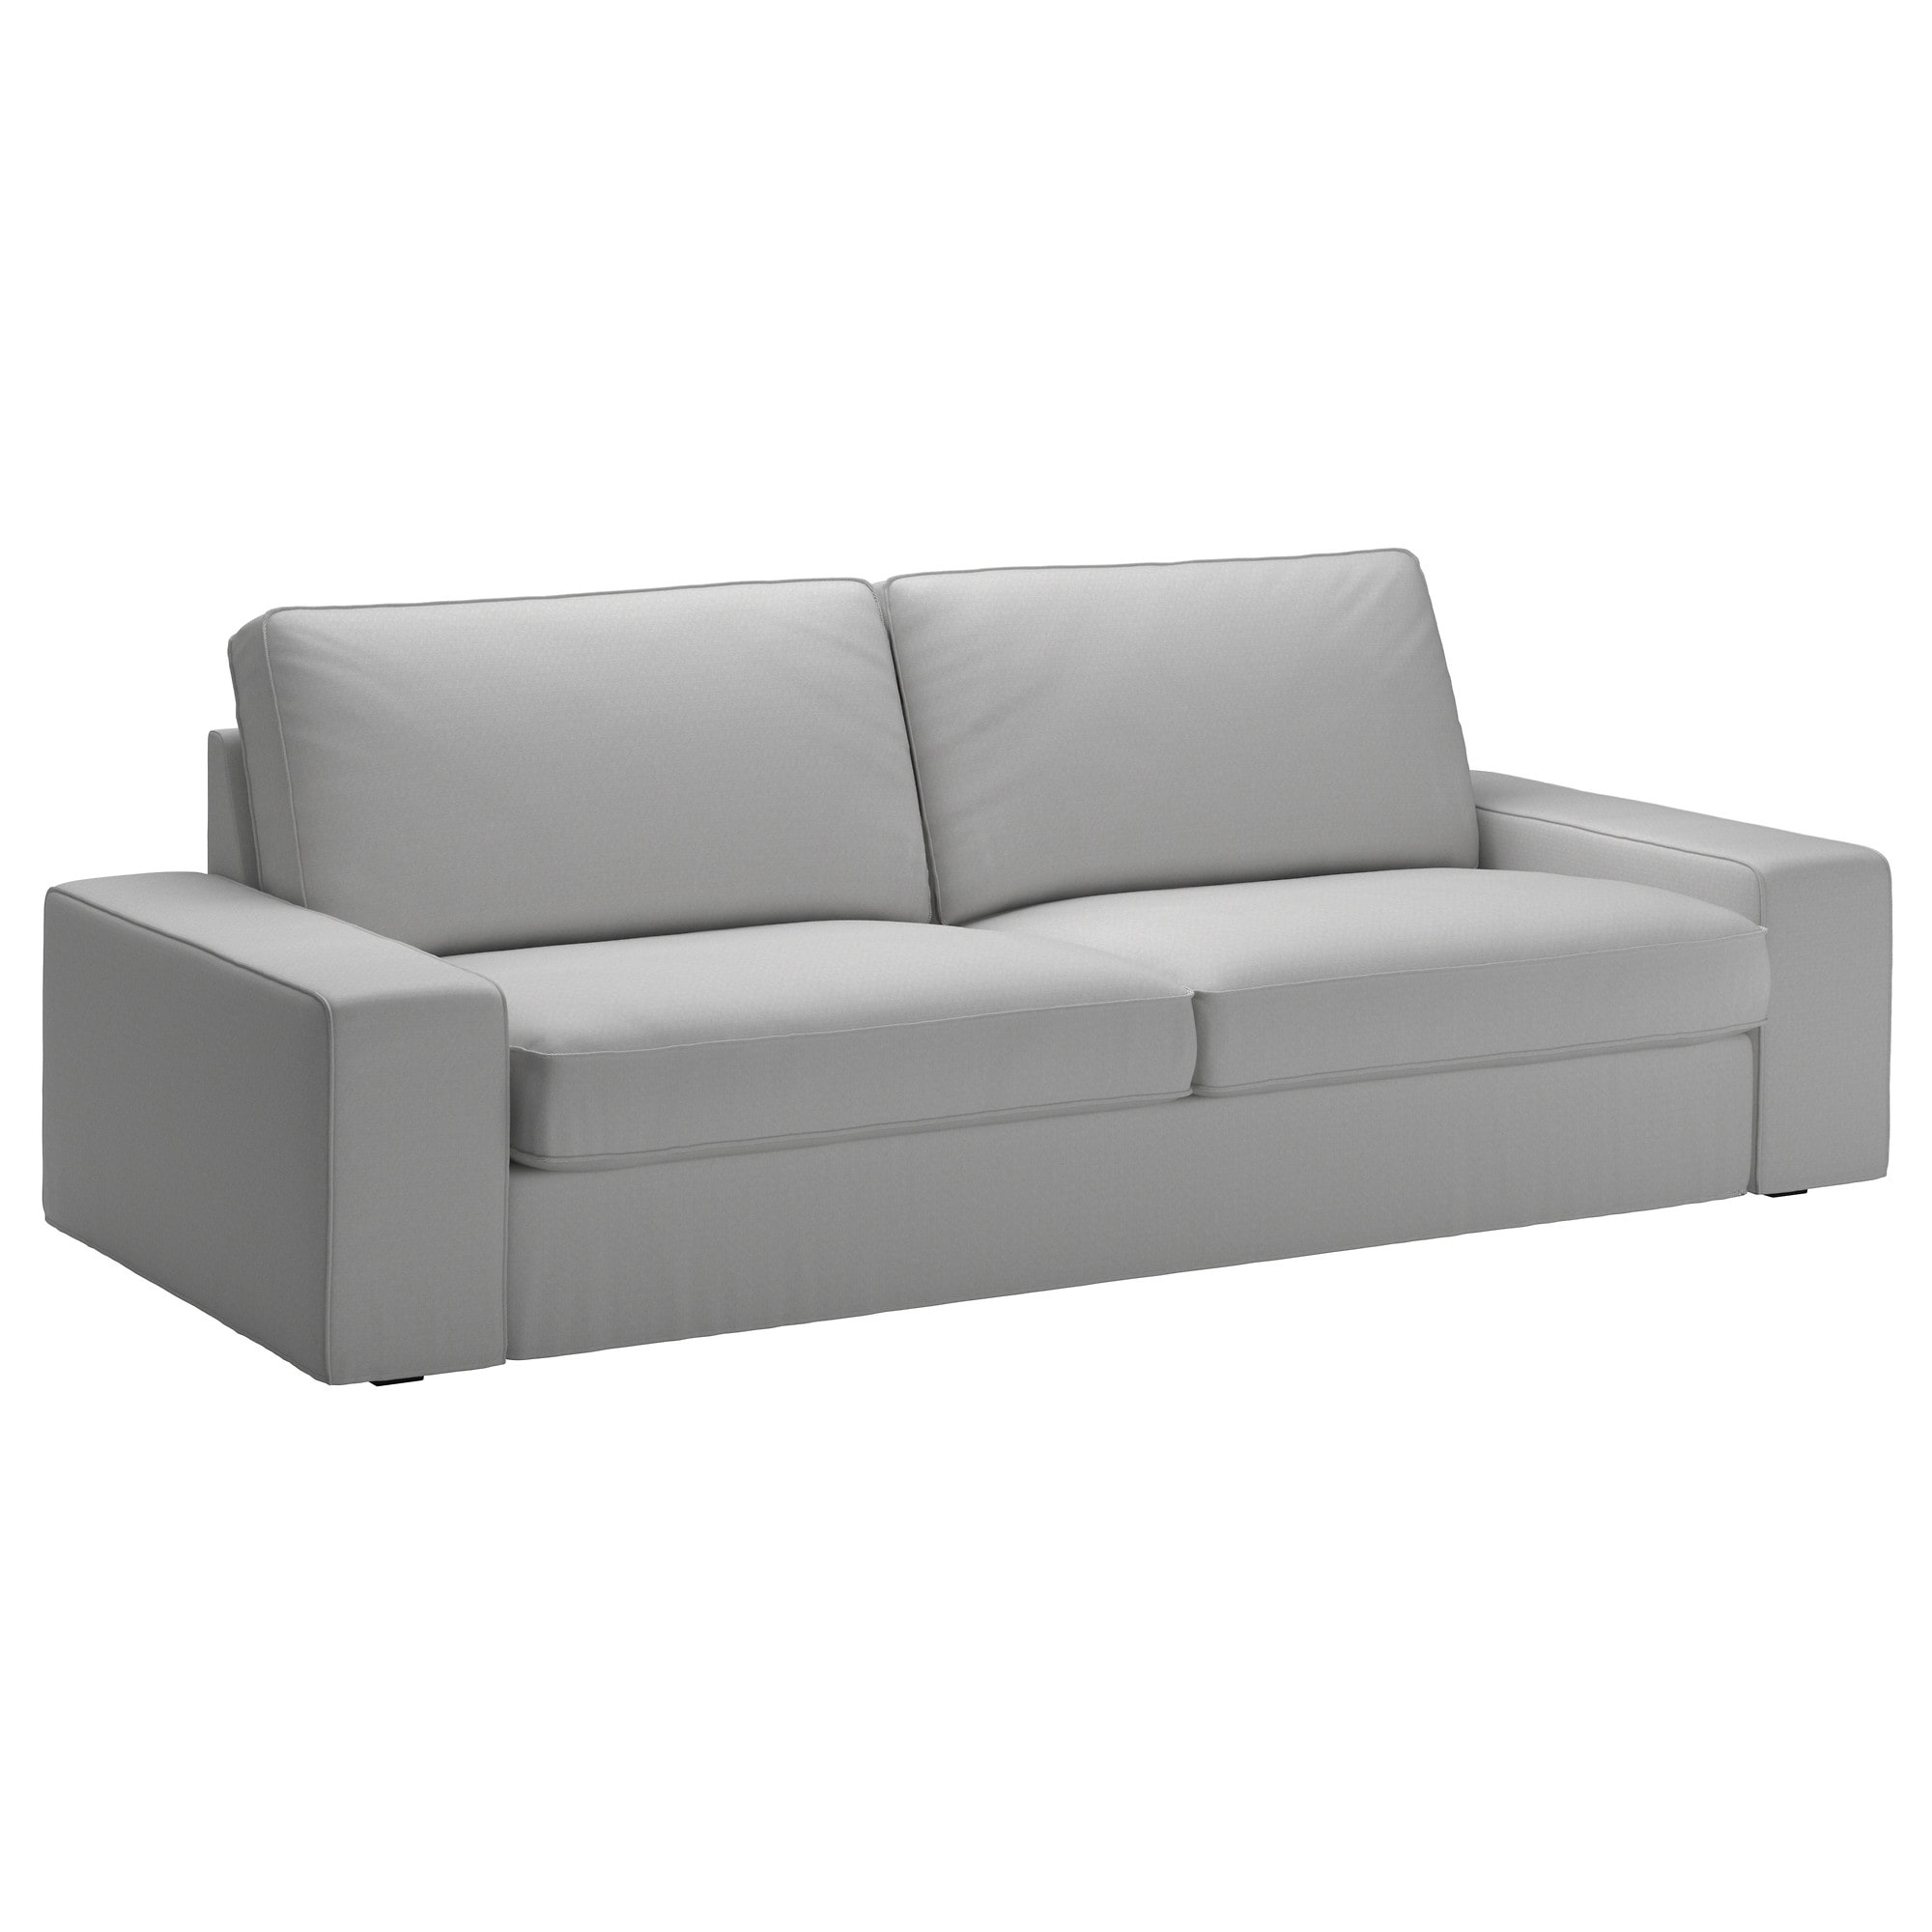 Sofa Extensible 3 Plazas Xtd6 Kivik sofà 3 Plazas orrsta Gris Claro Ikea